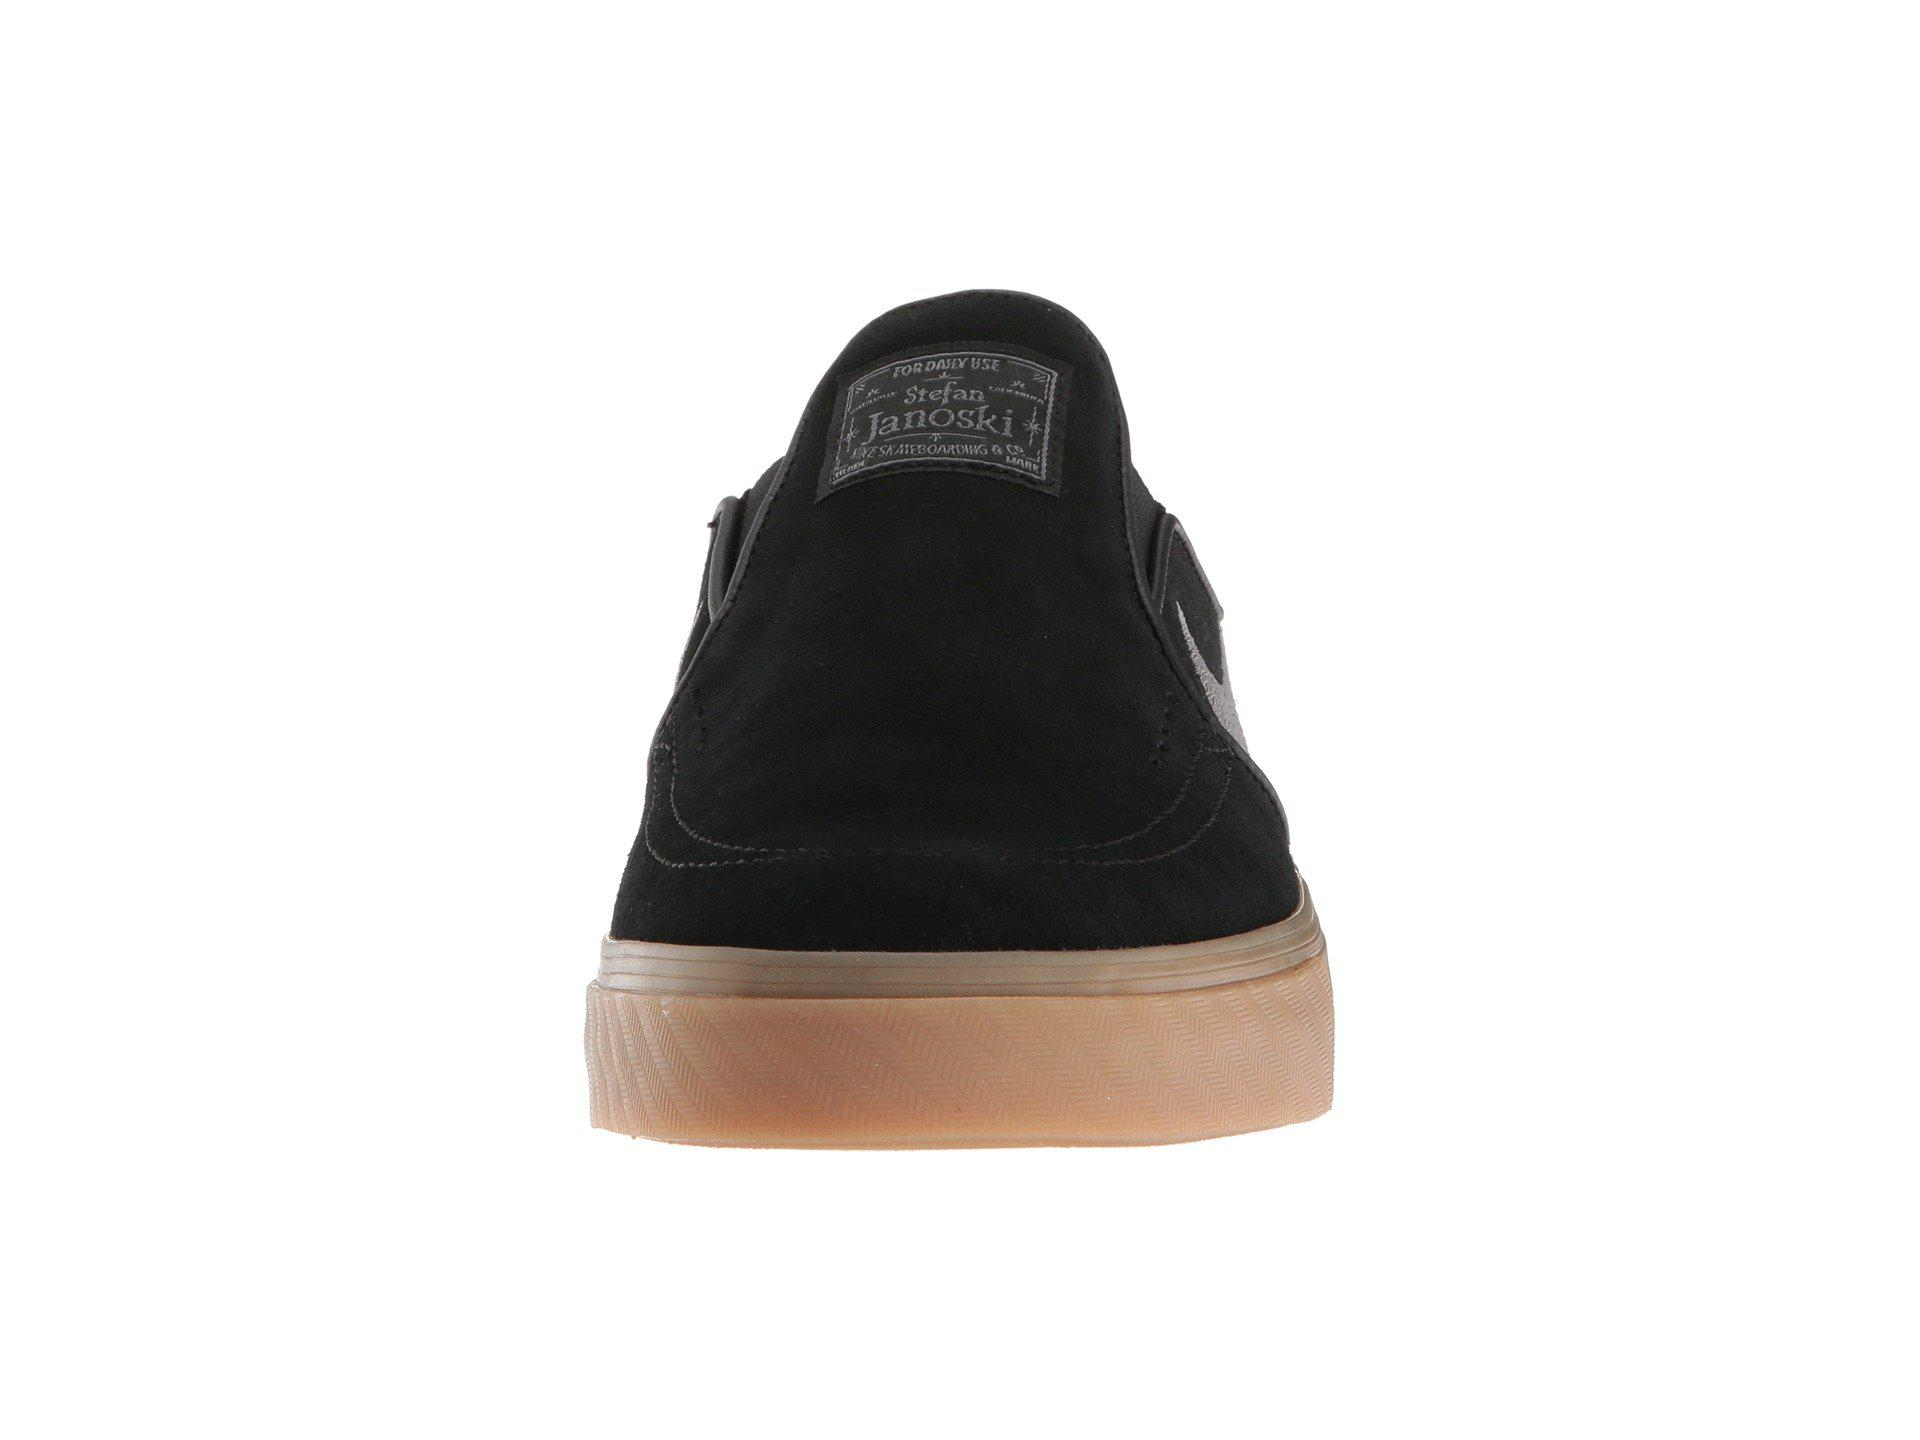 43706590698a8e Lyst - Nike Zoom Stefan Janoski Slip-on - Suede (black gunsmoke gum ...